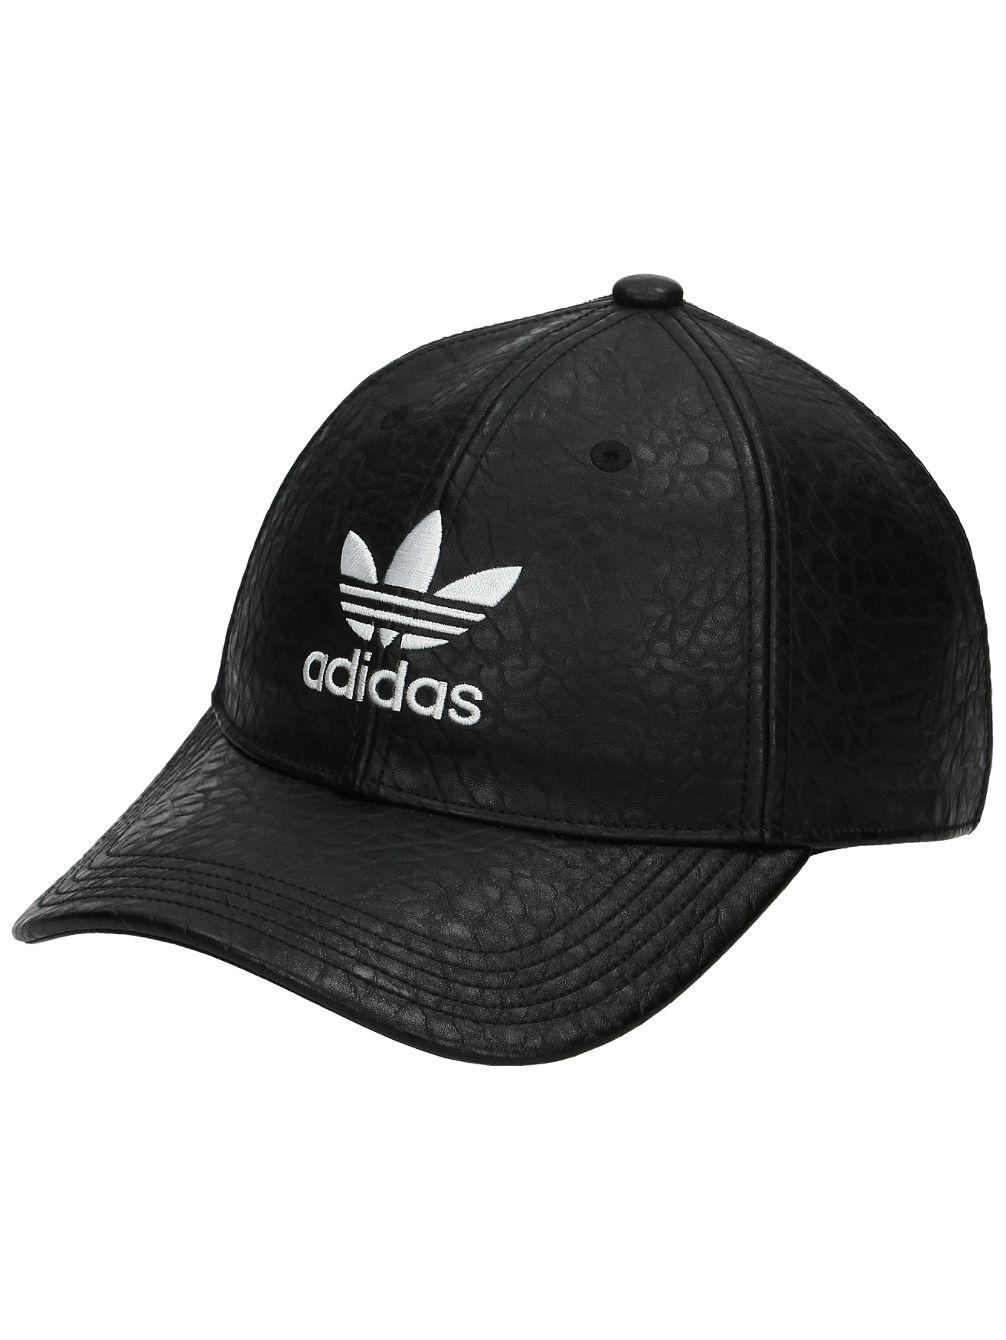 adidas-originals-baseball-adicolor-fashion-cap